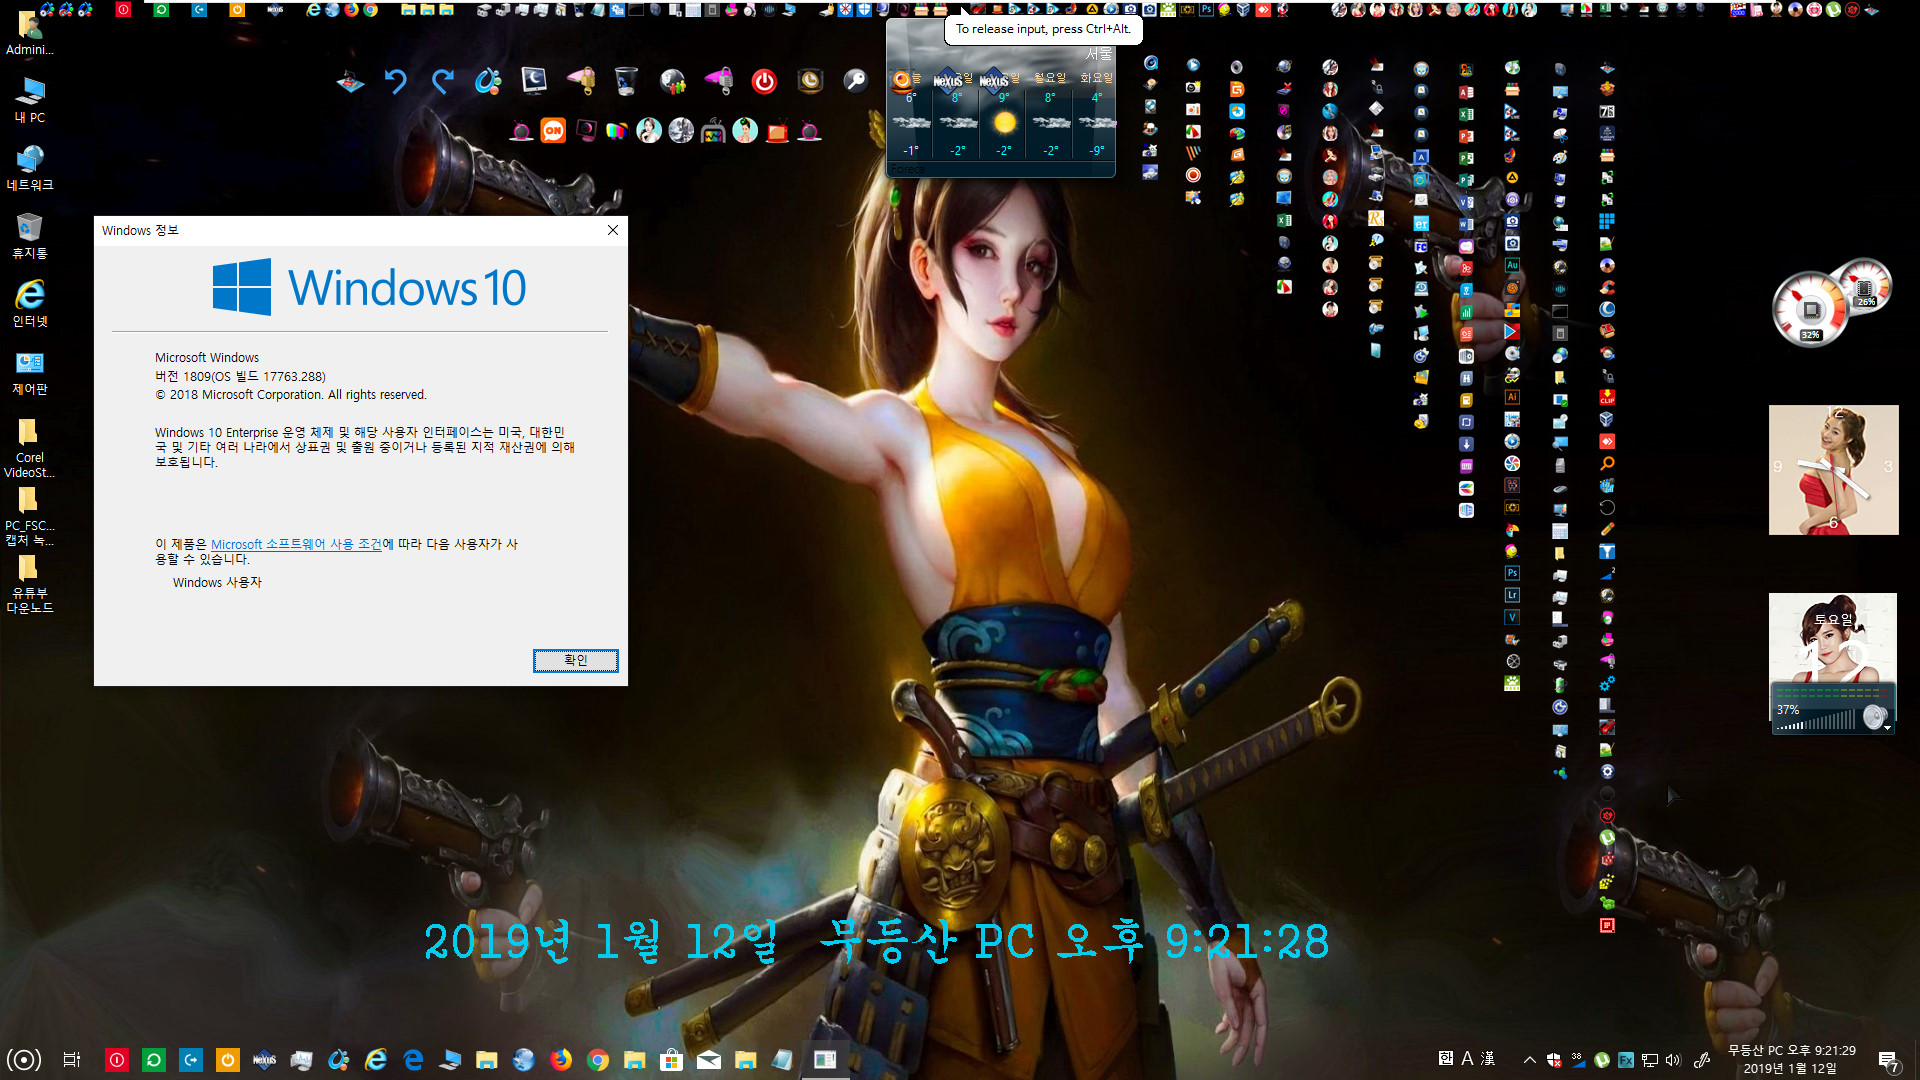 Windows 10 버전 1809 빌드 17763.228 (2019.1.15일) 파일은 17763.288 빌드 입니다 - vmware 구경하기 2019-01-12_212129.jpg